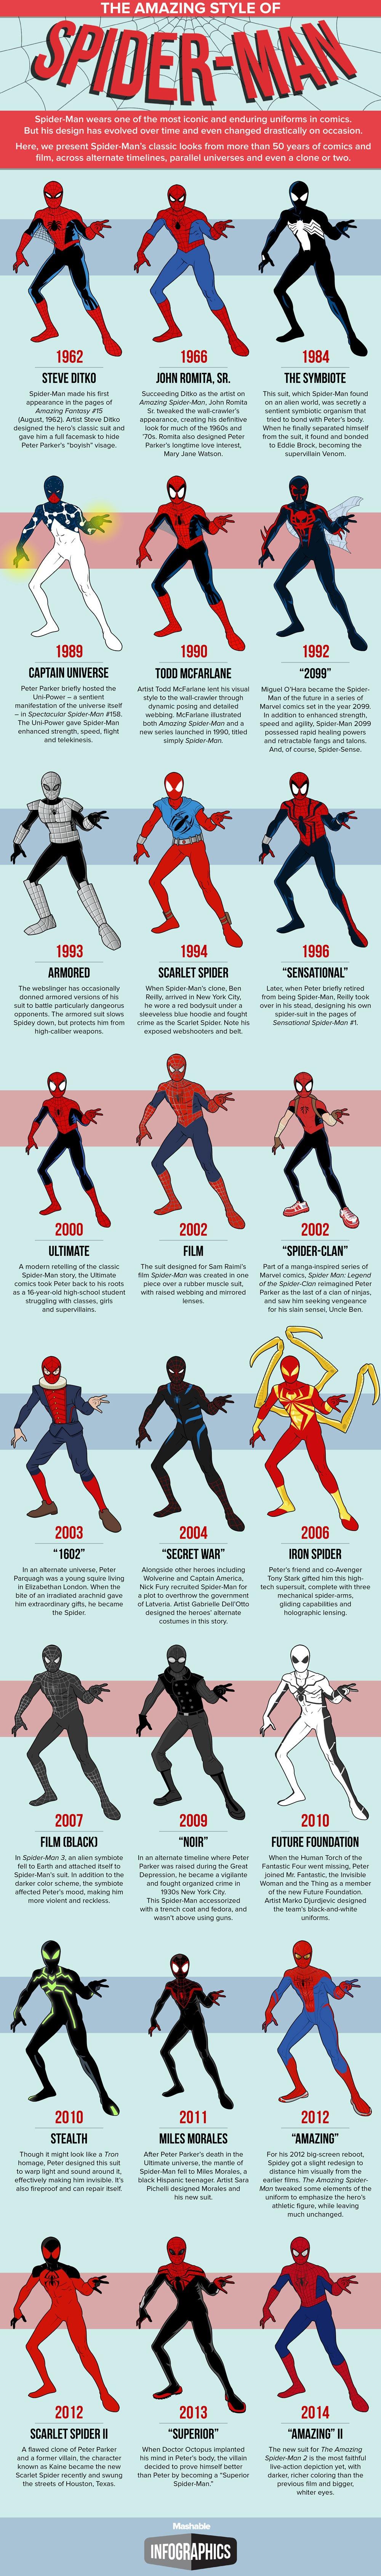 Spiderman's Costumes